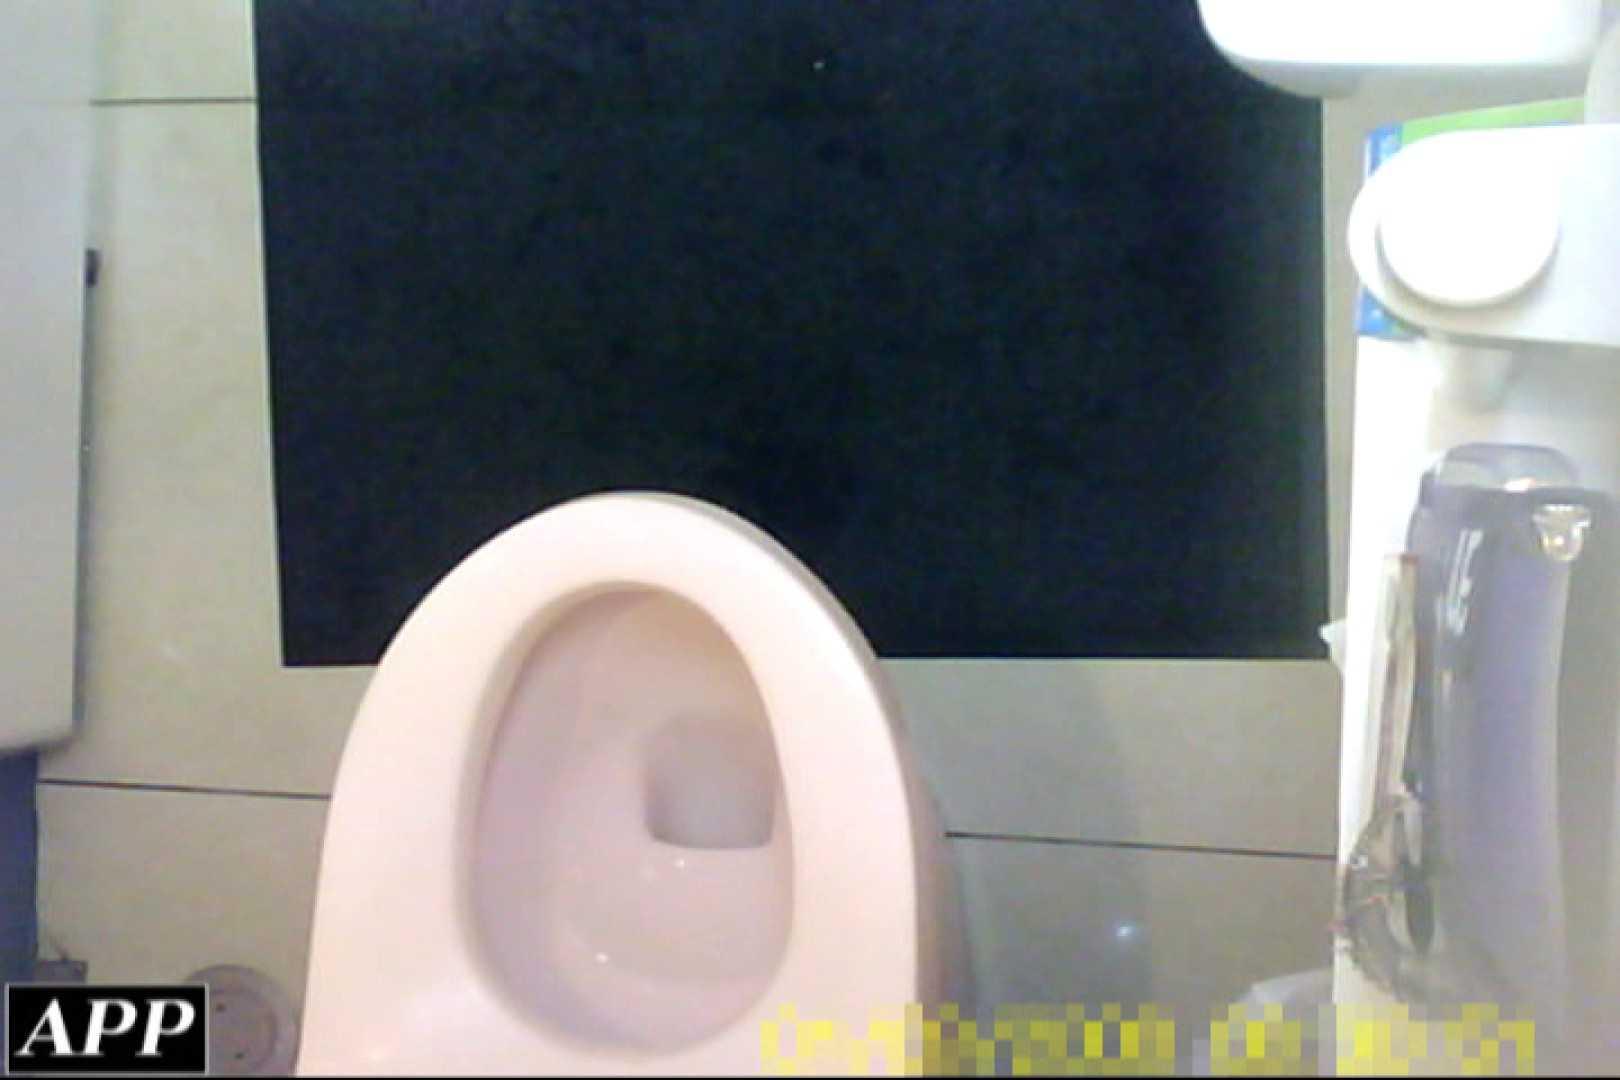 3視点洗面所 vol.066 OLエロ画像  41PICs 34